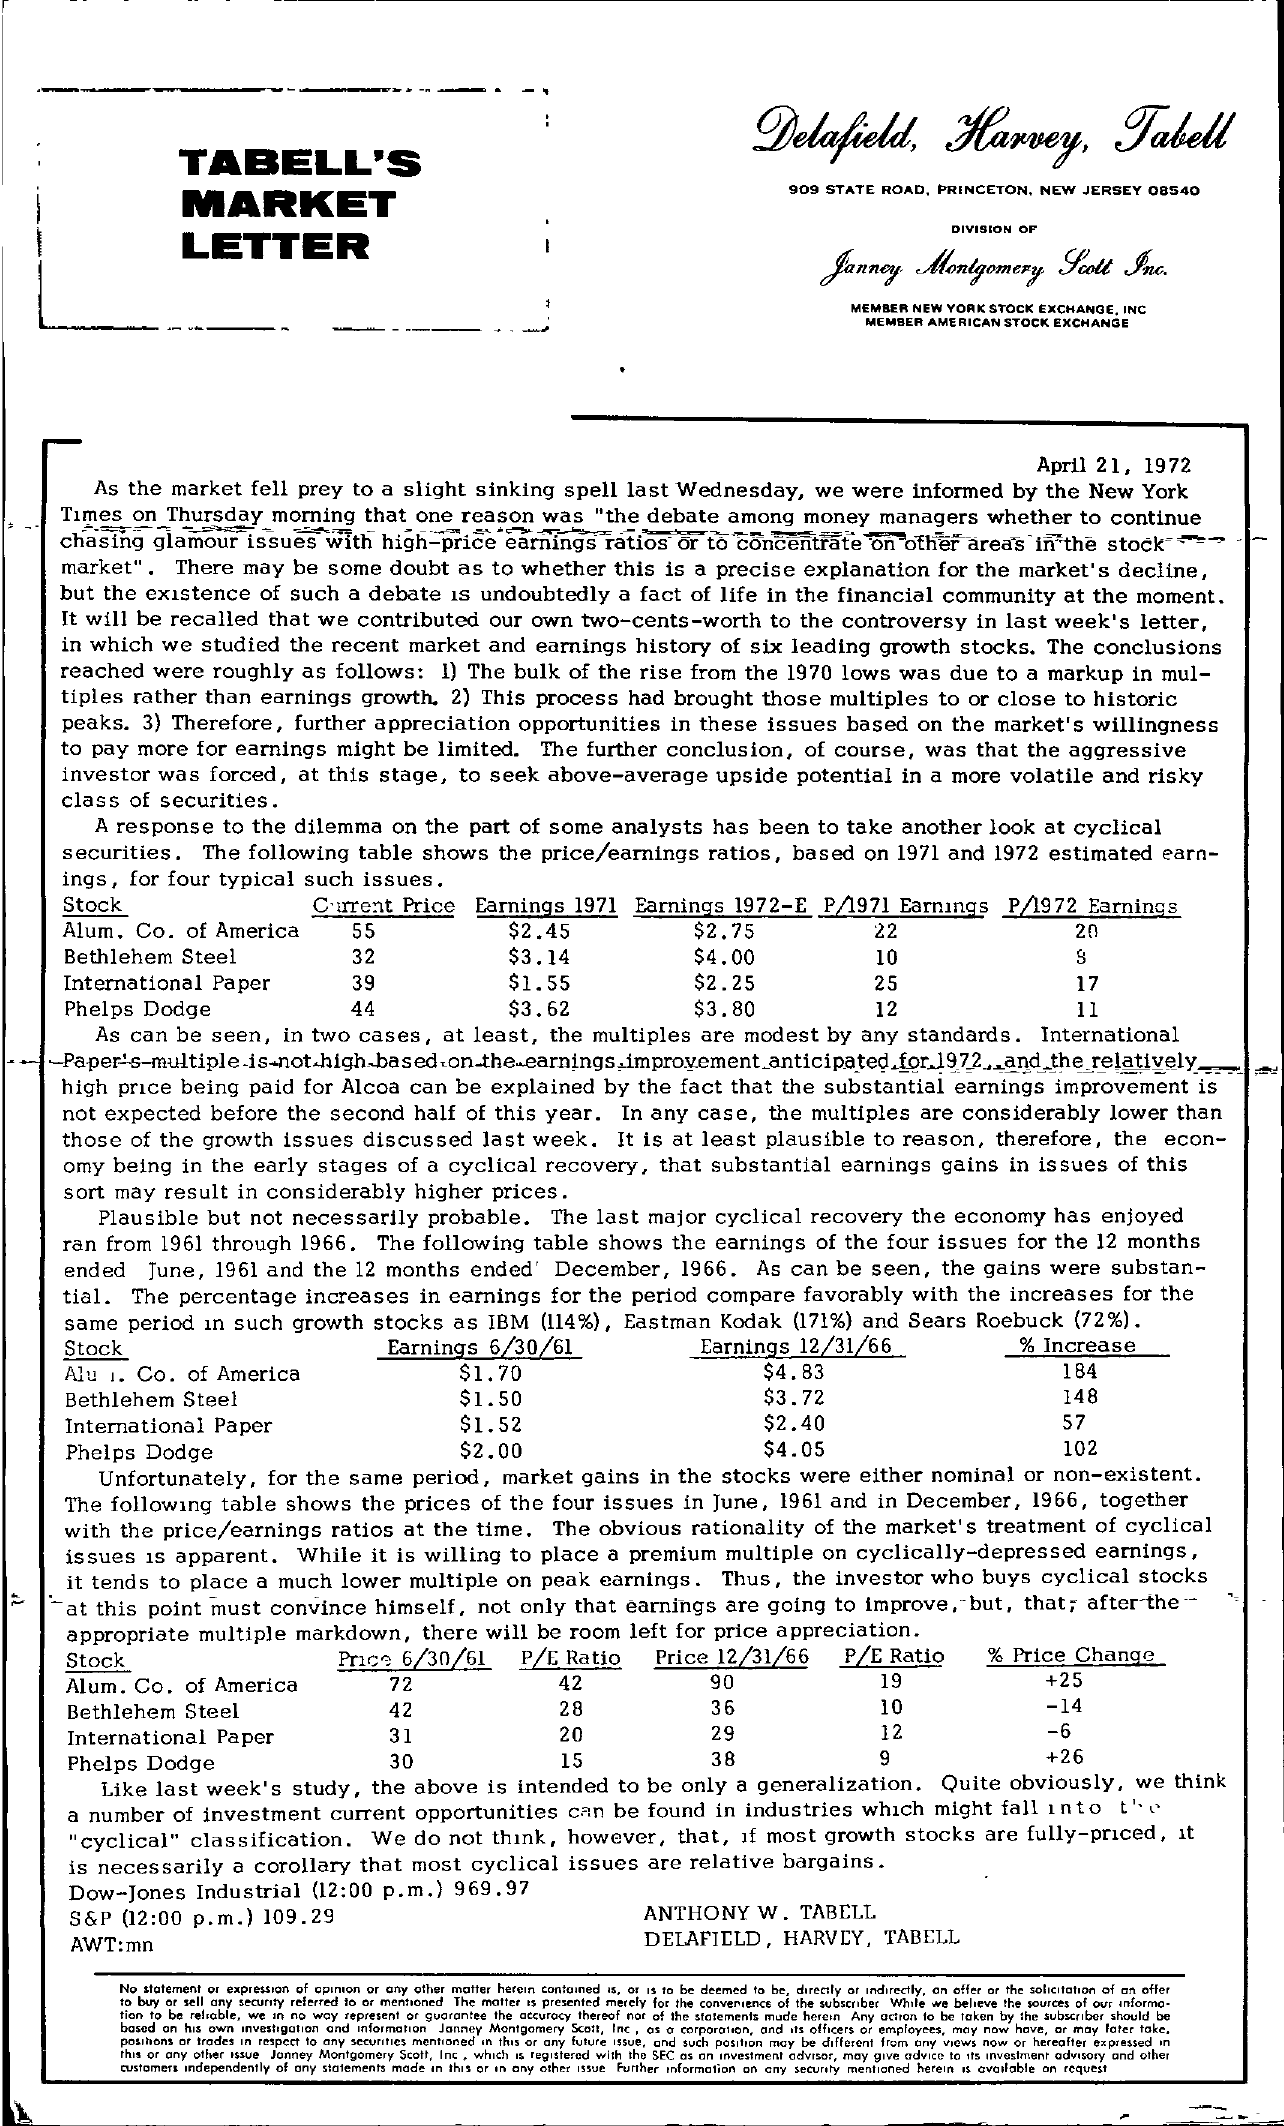 Tabell's Market Letter - April 21, 1972